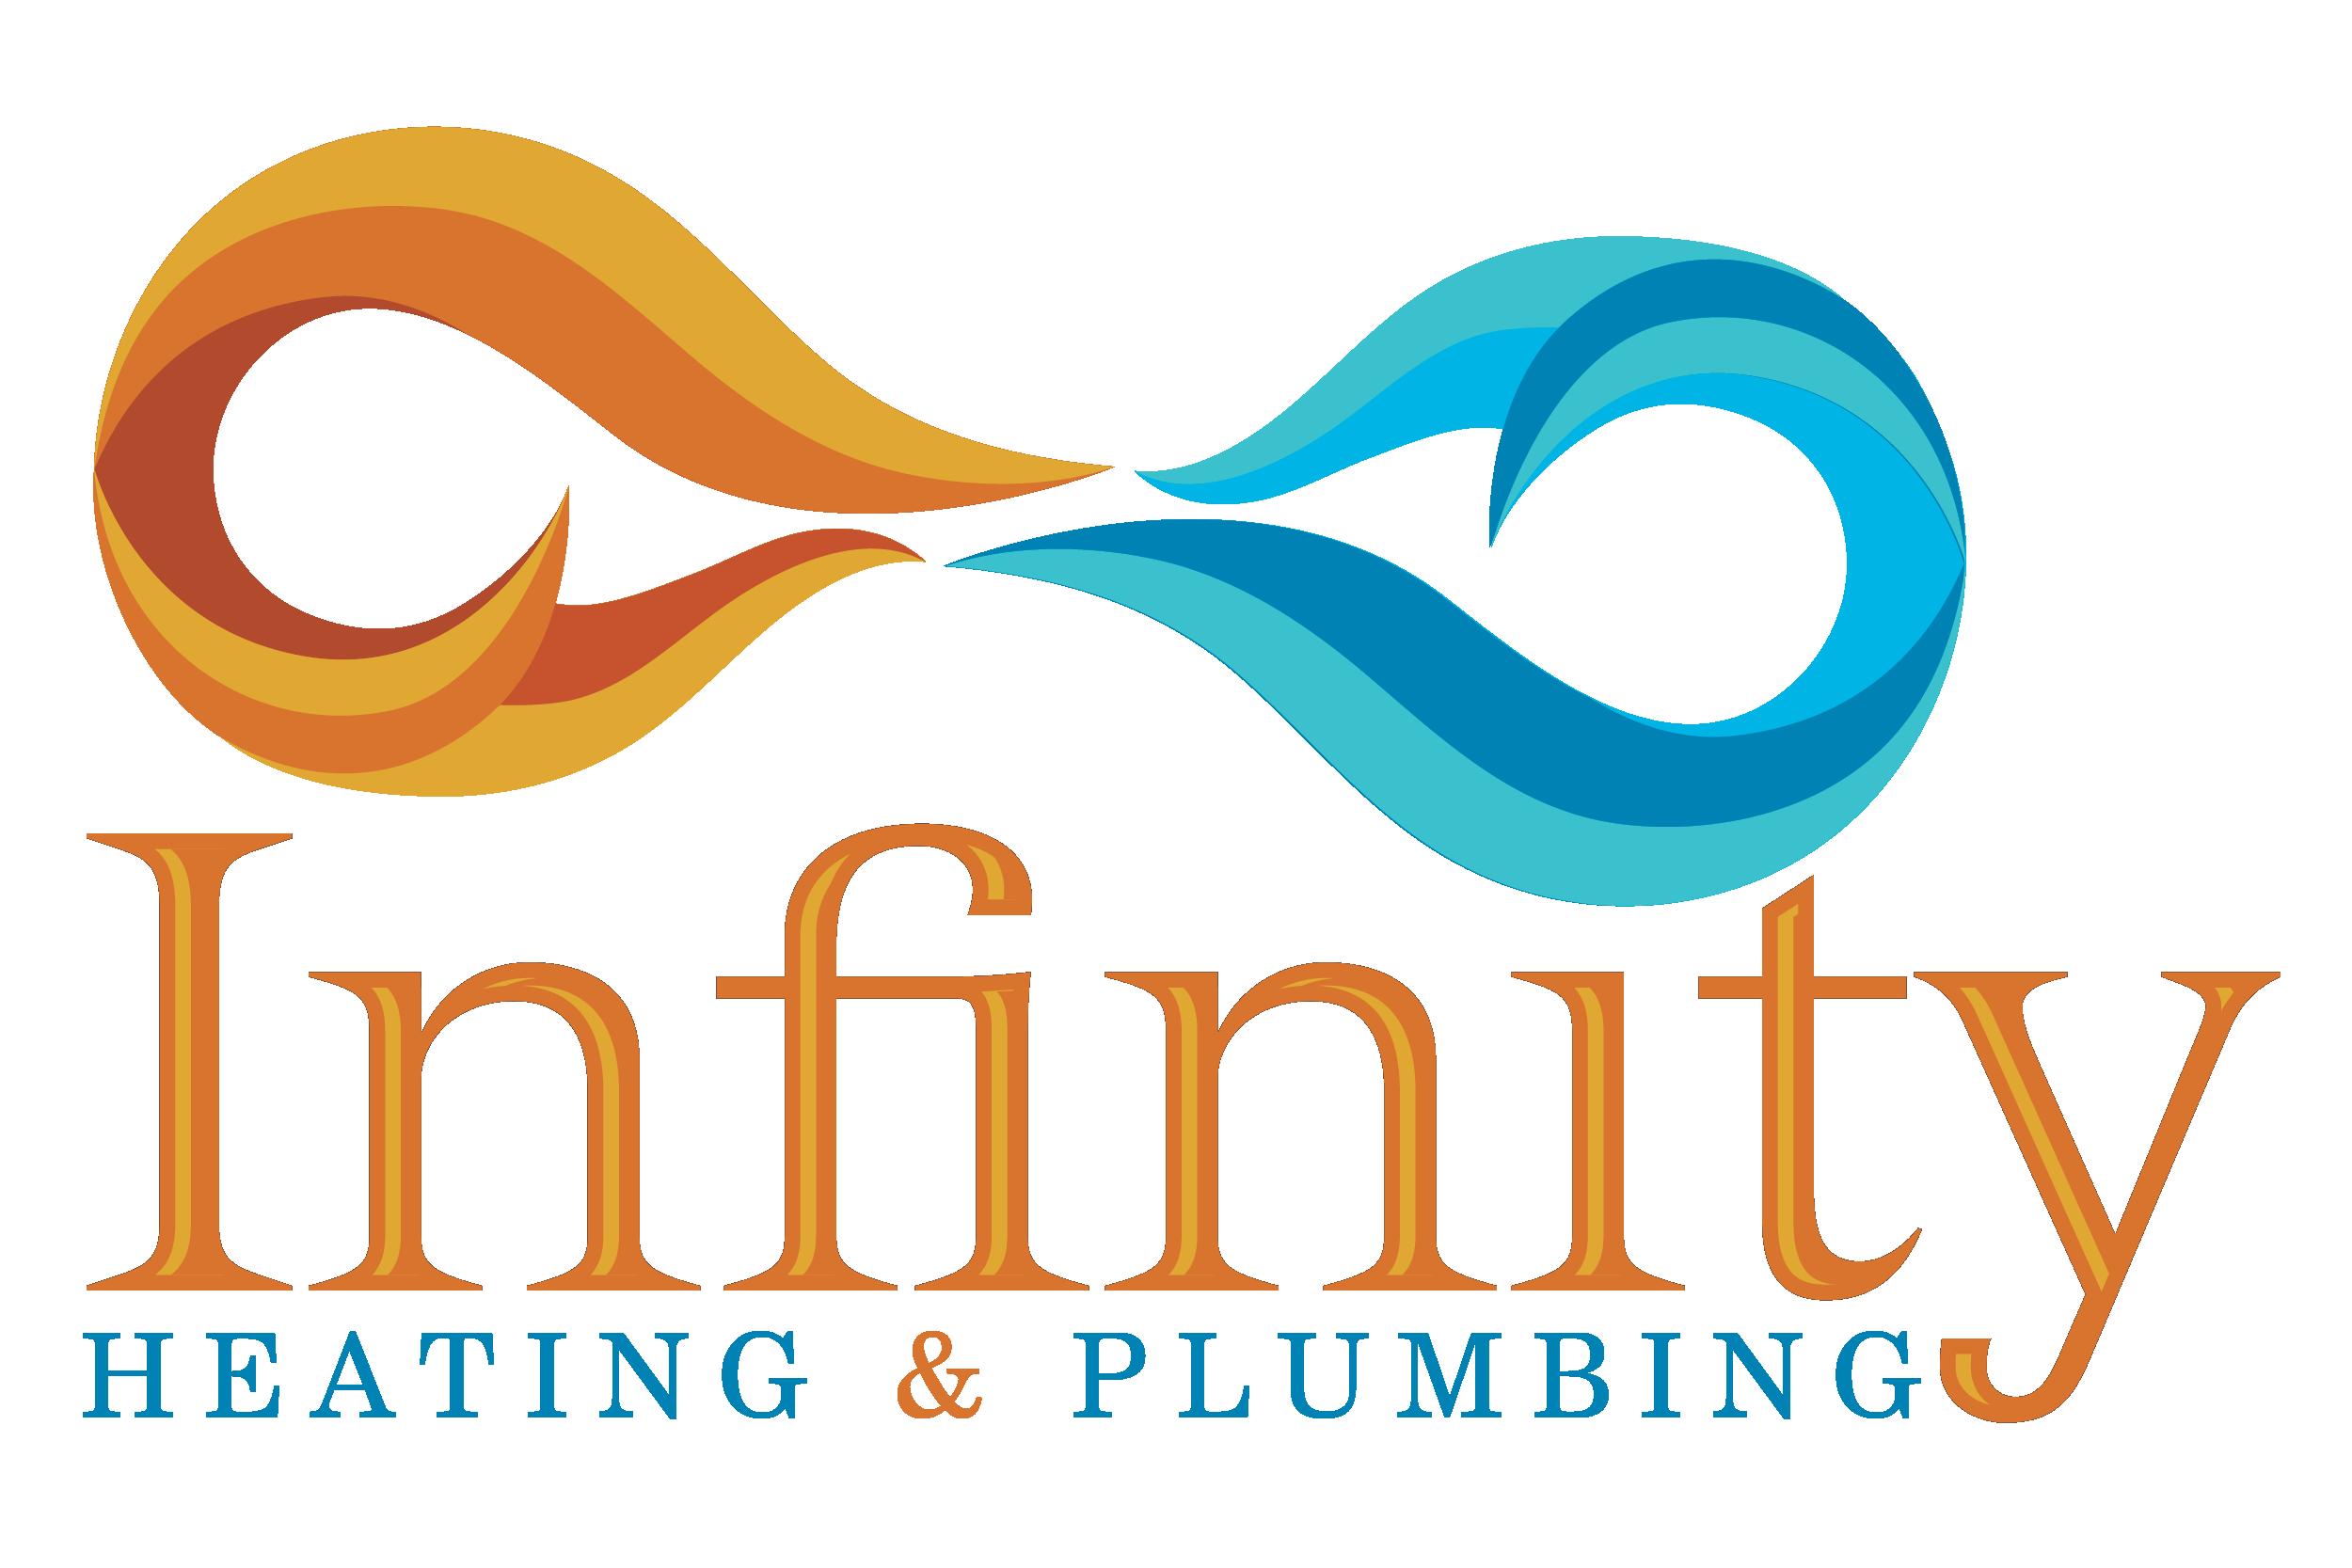 Infinity Heating & Plumbing Verified Logo